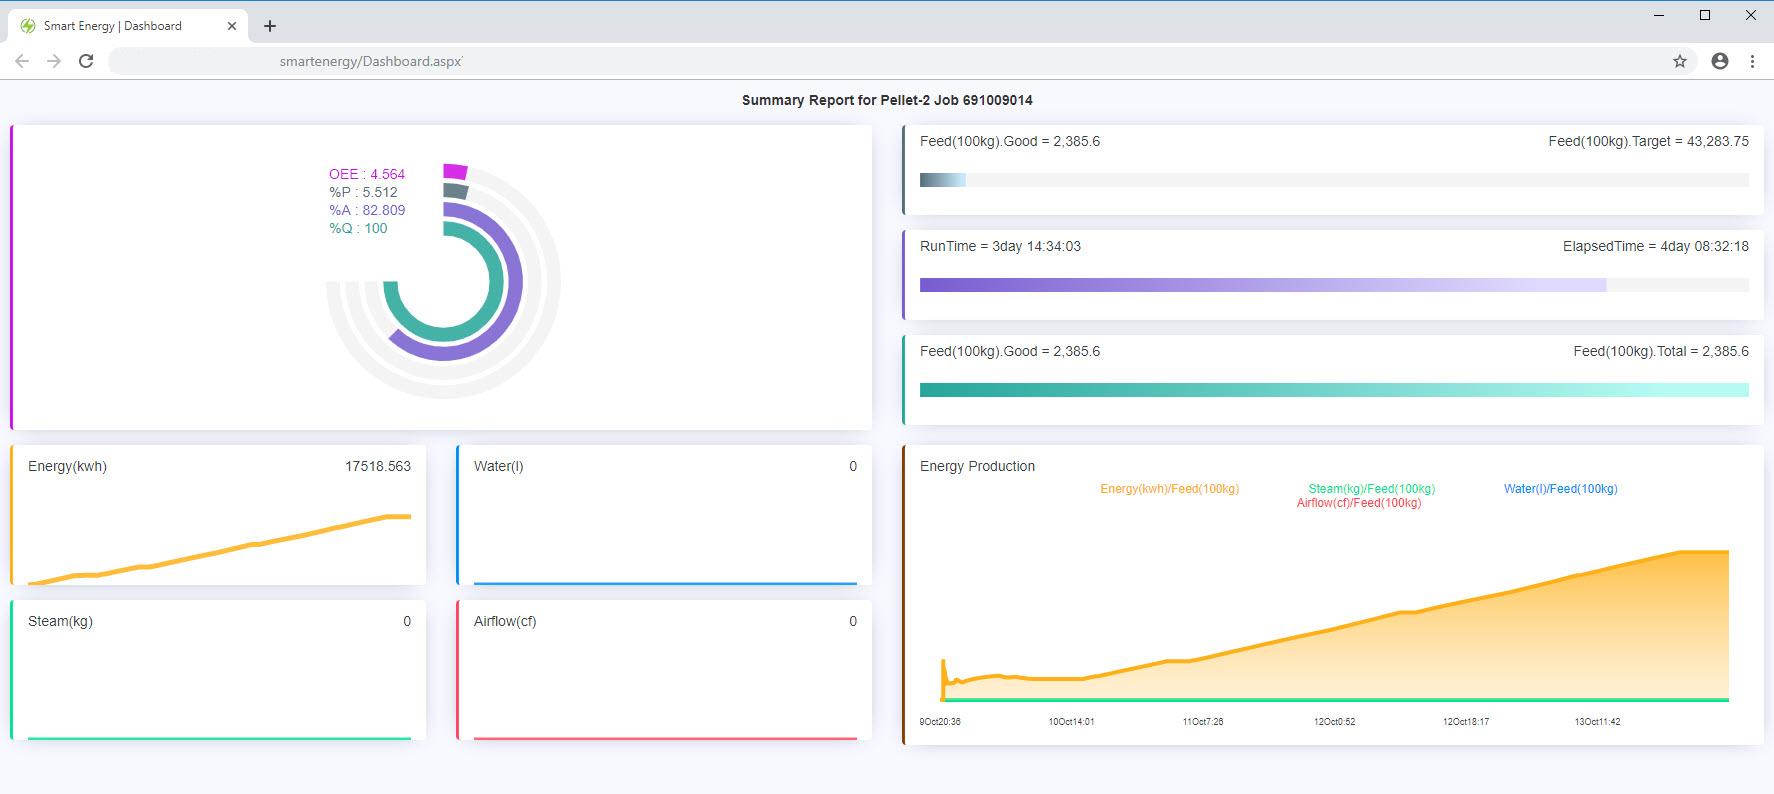 OEE Real Time, IoT OEE, OEE Report, SmartEE® Version5.0 โปรแกรมบริหารจัดการพลังงานไฟฟ้า รายงานแบบ IoT OEE การแสดงผลบน Cloud ส่งรายงานผ่าน LINE Application